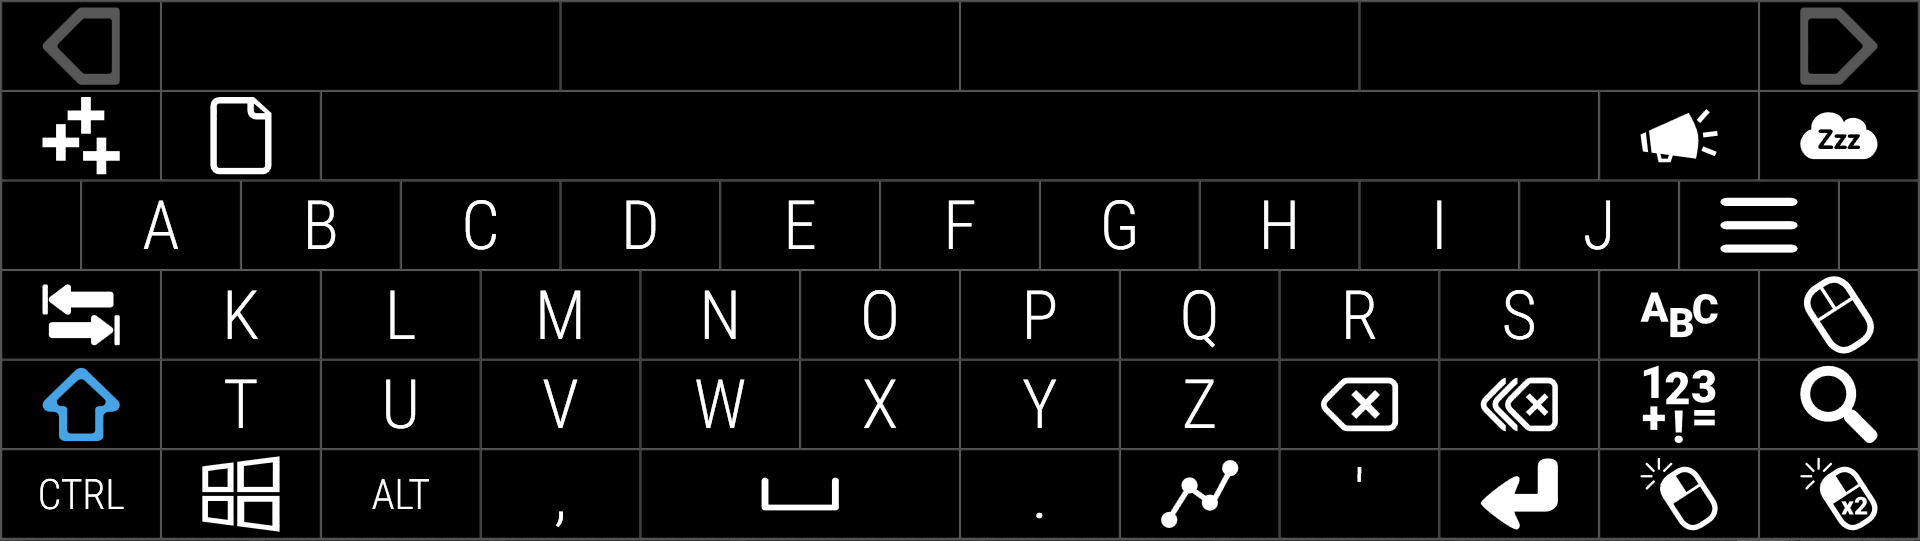 Alphabetical alpha keyboard